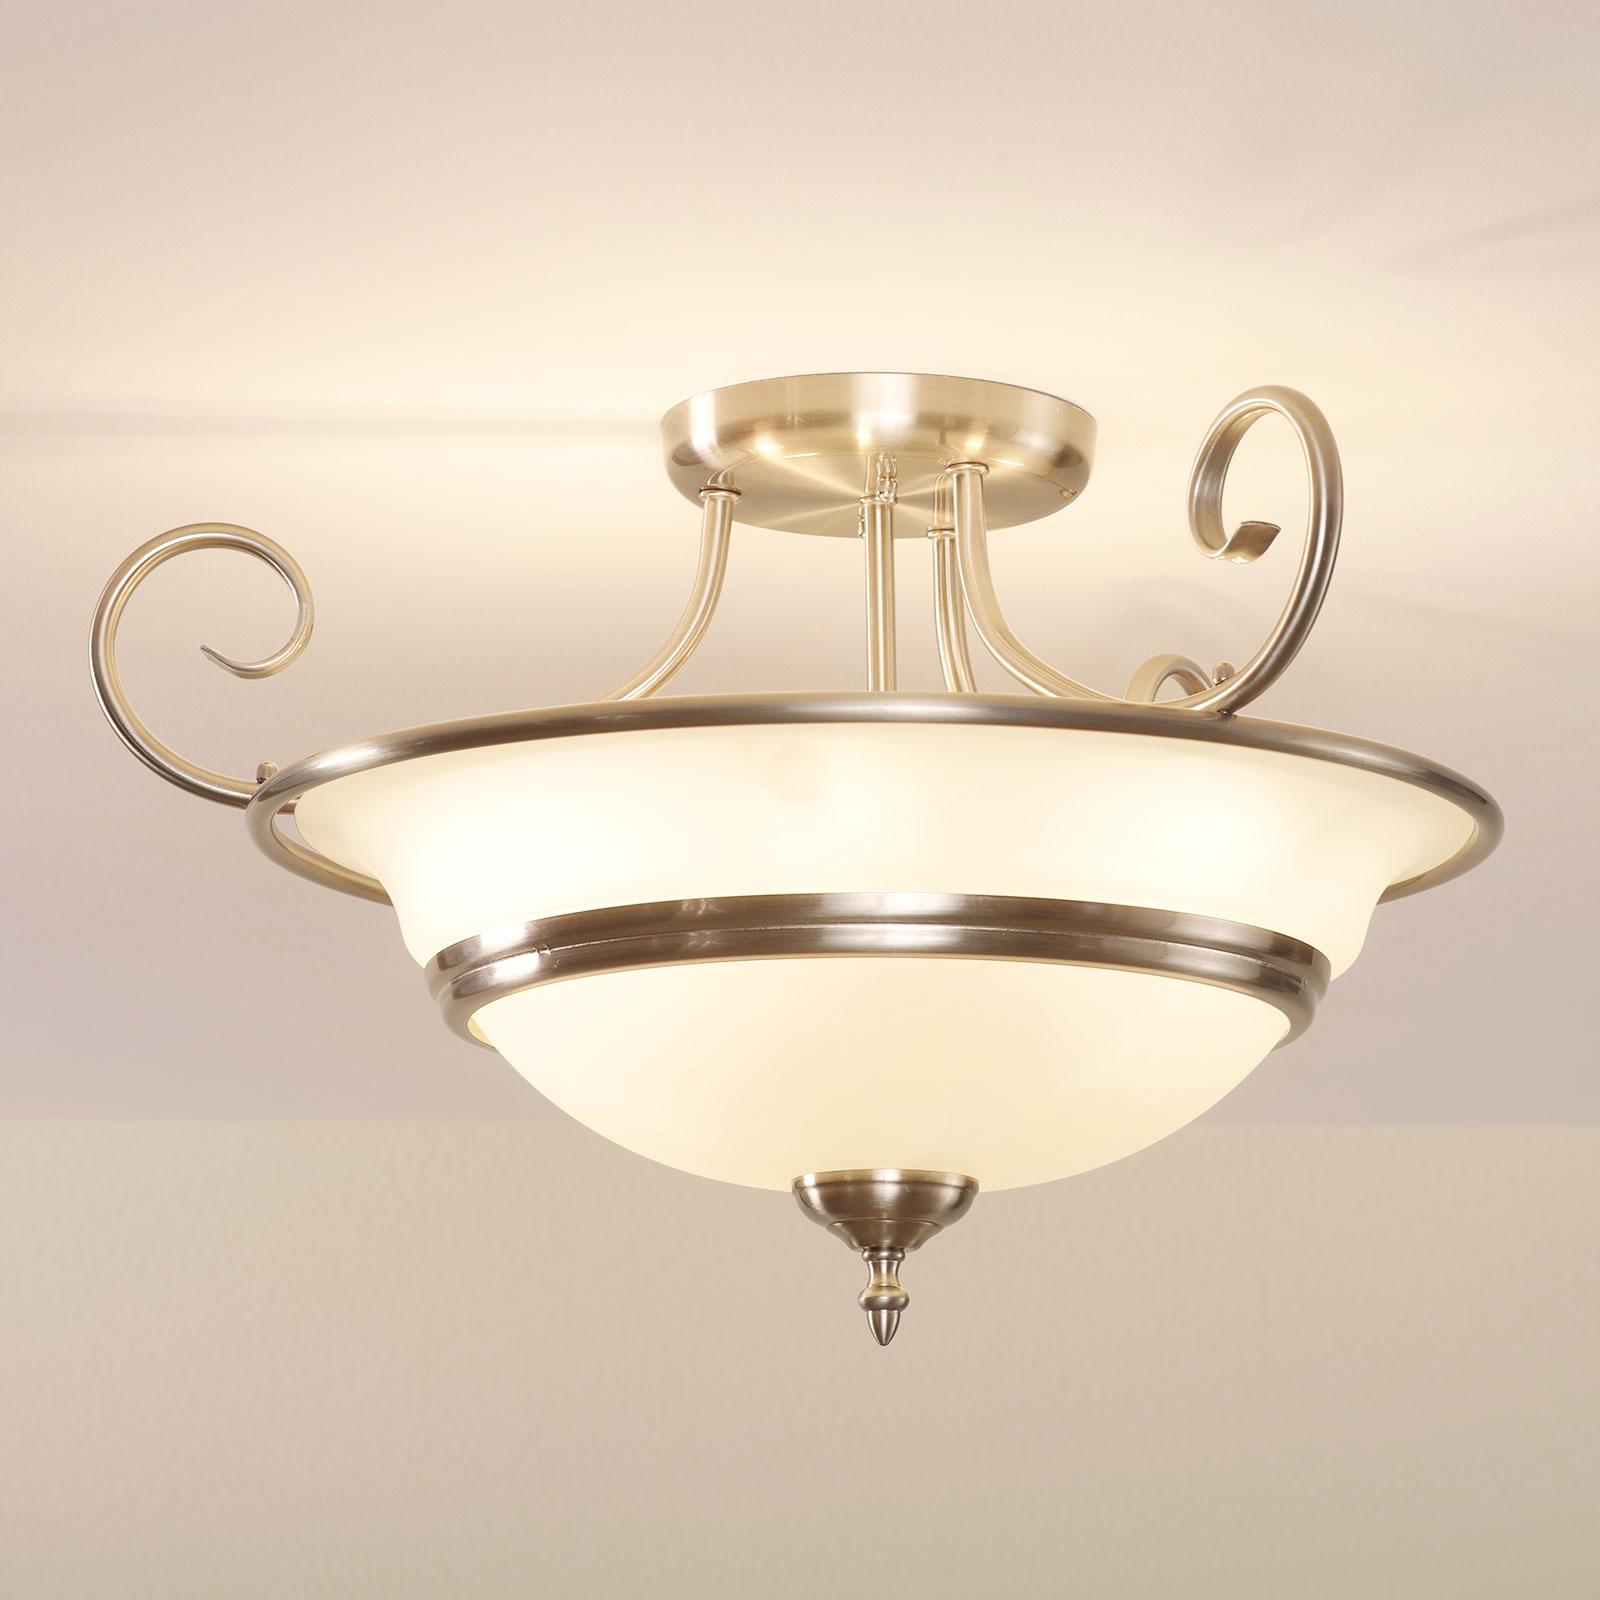 Plafondlamp Ursula uit glas, rond, mat nikkel